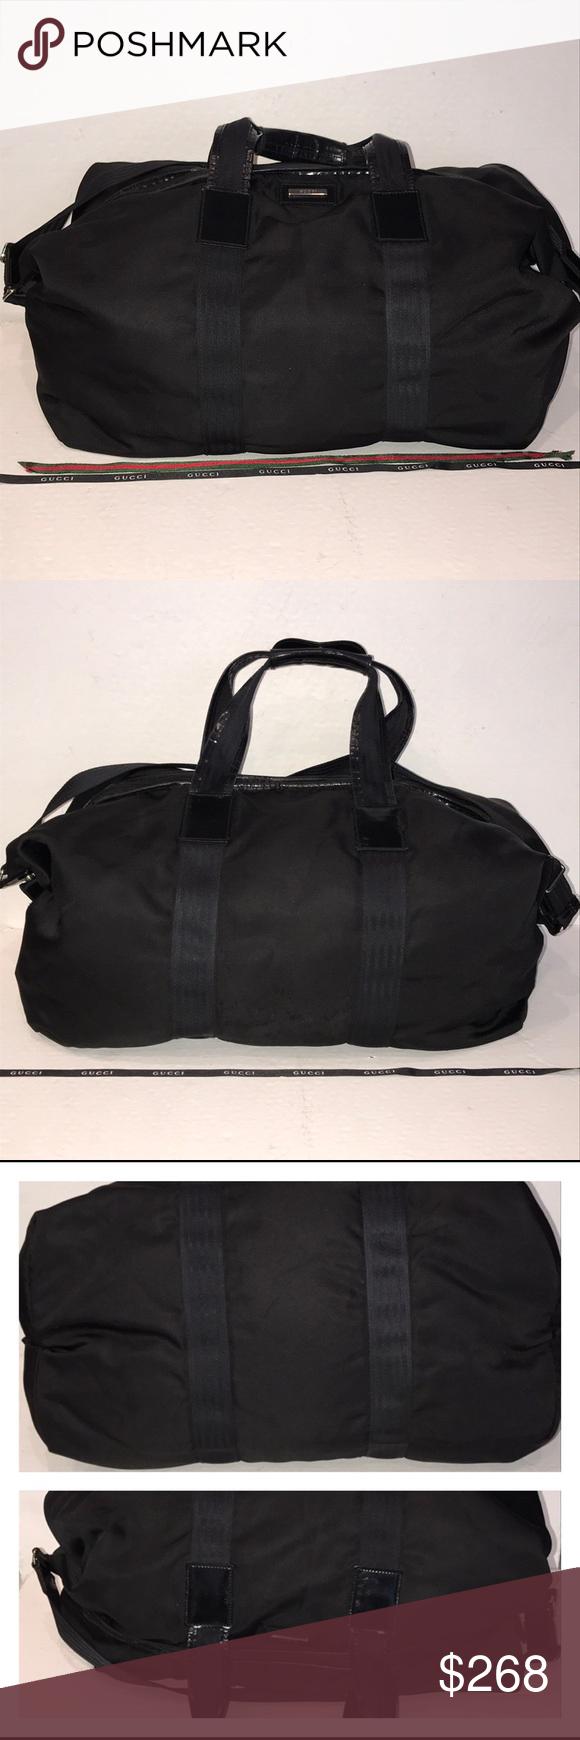 9db629c79406 Authentic Gucci Vintage Black Nylon Duffel Bag 👀 Pre-owned authentic Gucci  nylon duffel bag